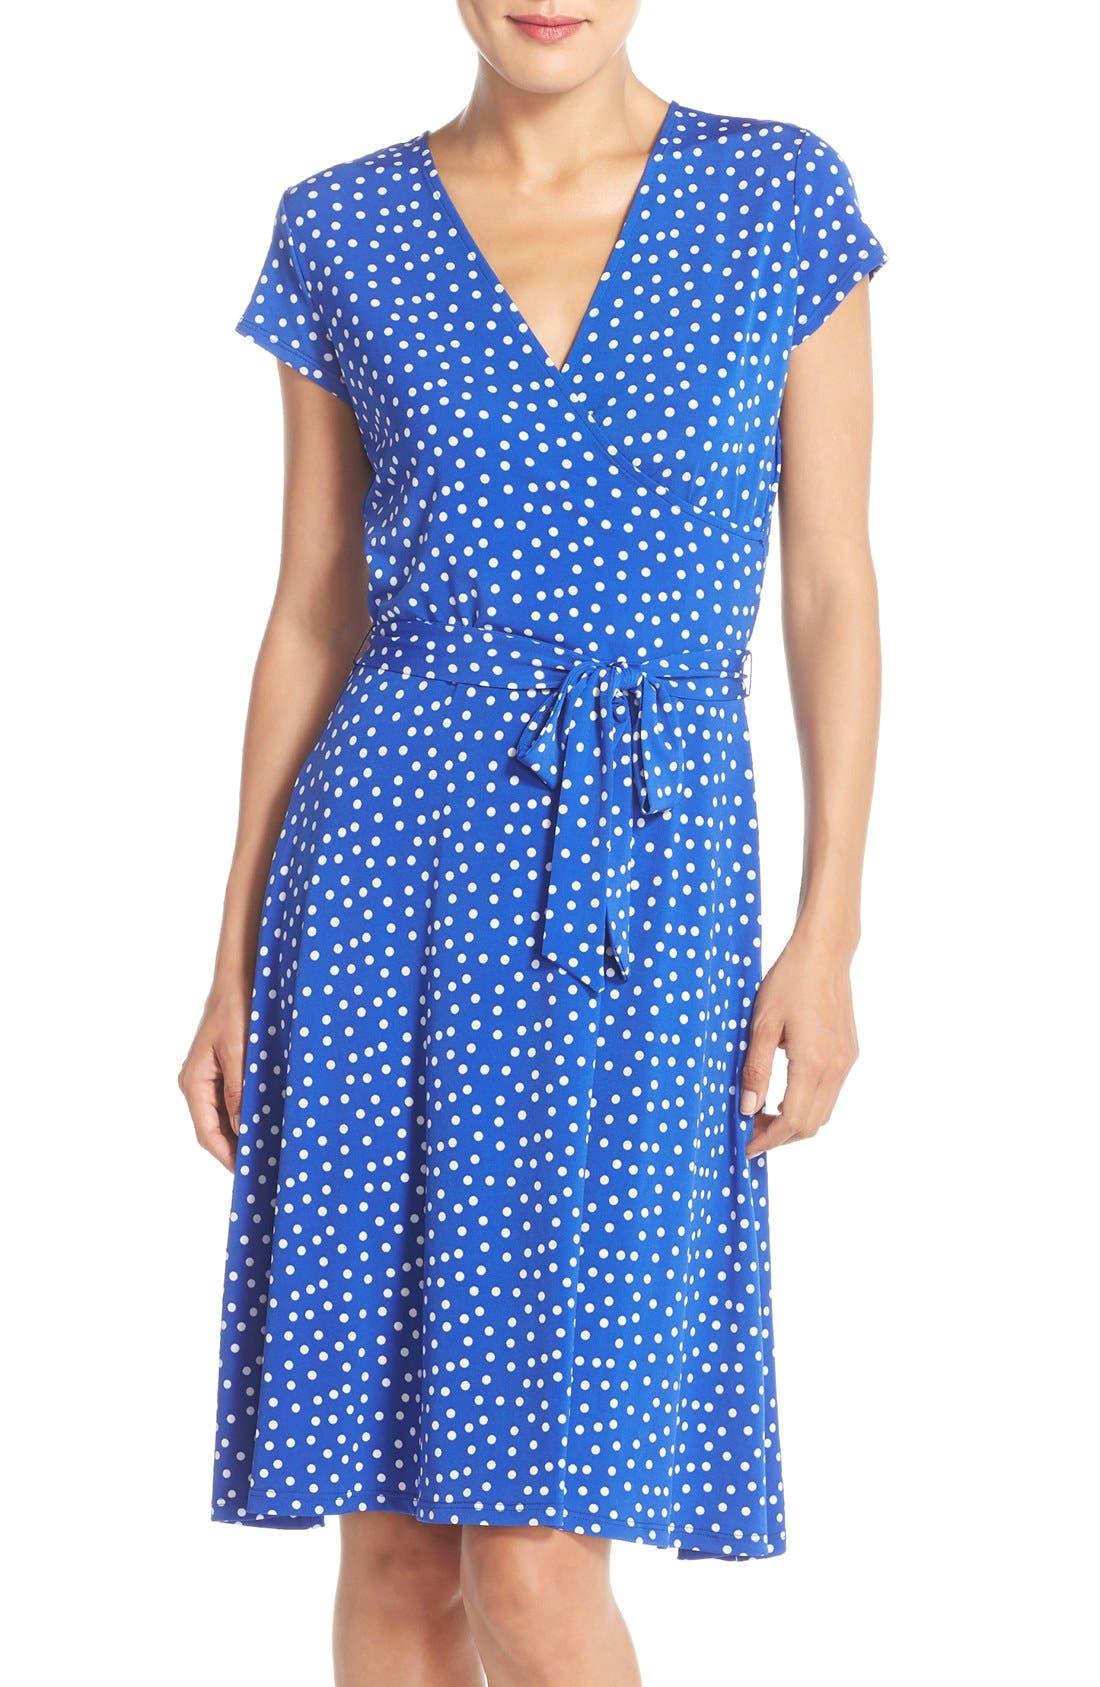 Alternate Image 1 Selected - Leota 'Perfect' Faux Wrap Polka Dot Jersey Dress